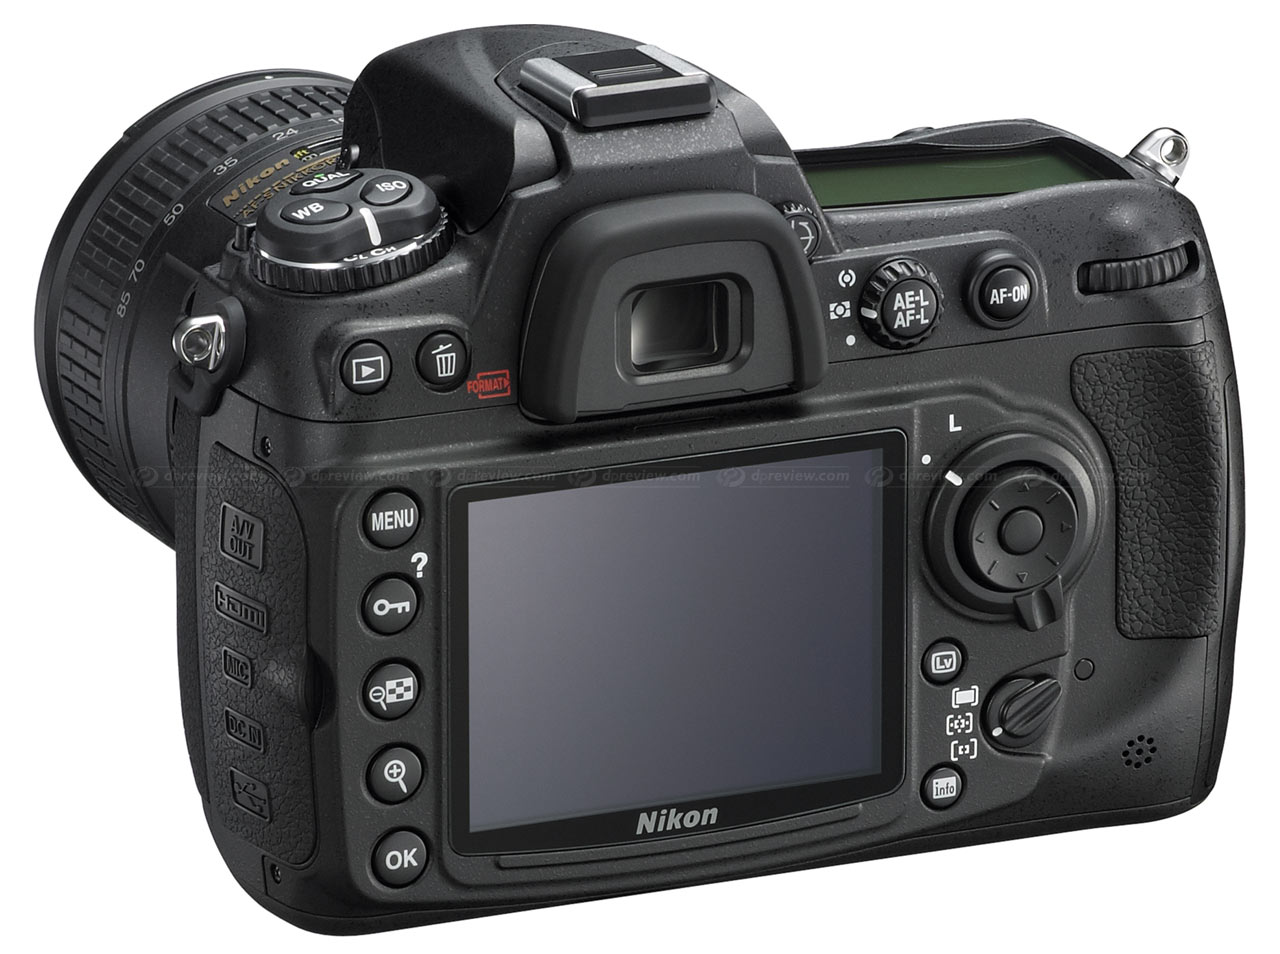 Paid by credit card nikon camera control pro 2